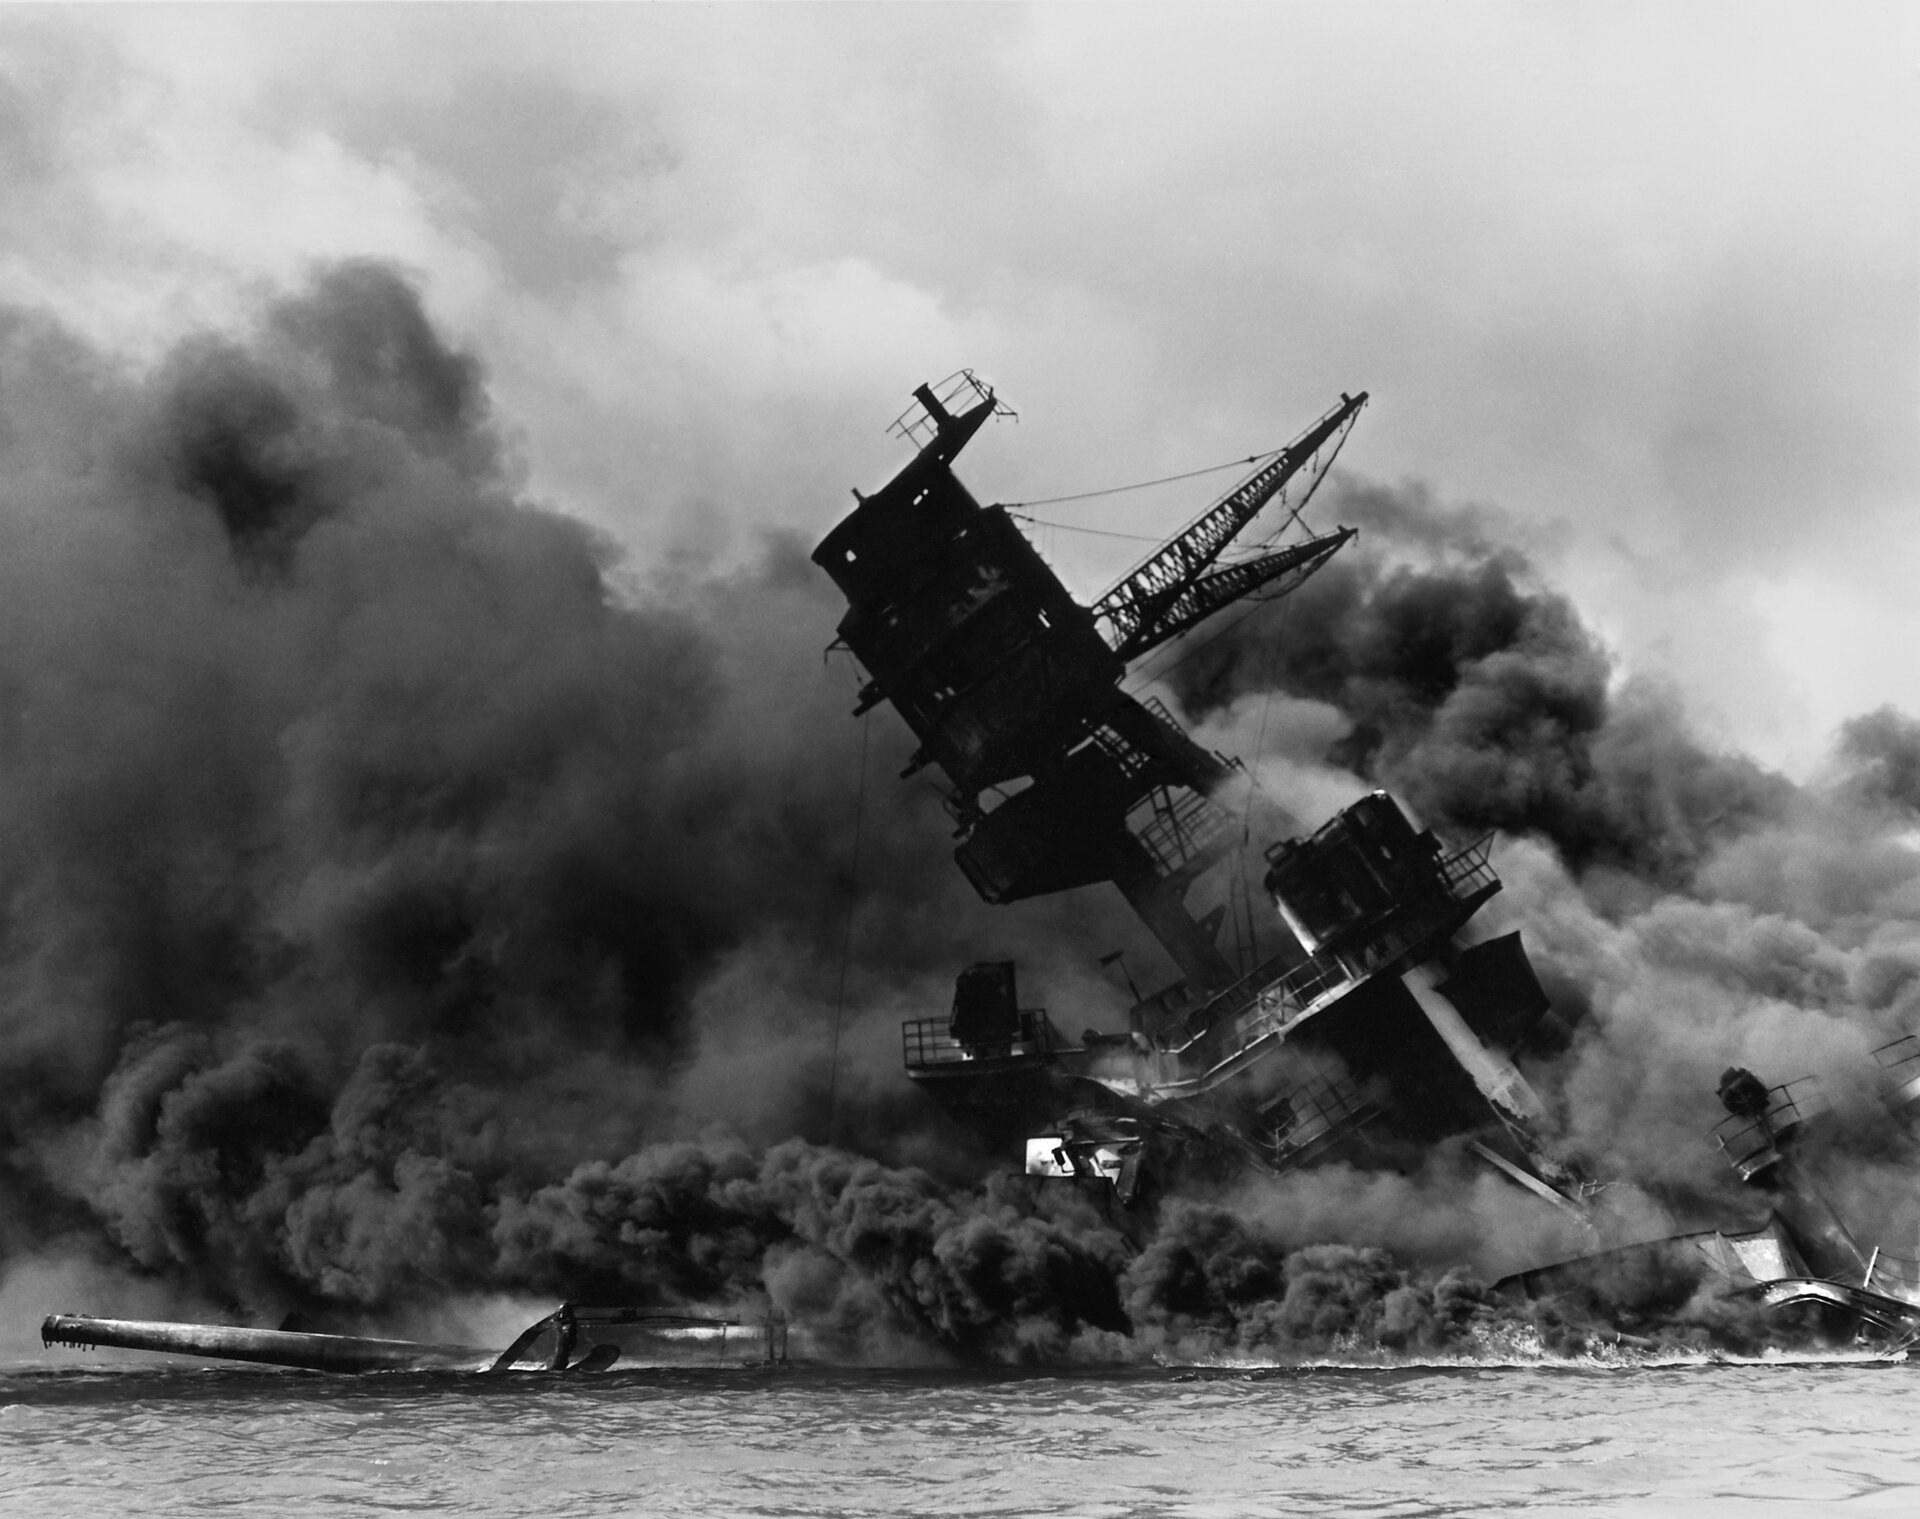 USS Arizona (BB-39) po ataku na Pearl Harbor Zdjęcie nr 1 Źródło: Mmxx, USS Arizona (BB-39) po ataku na Pearl Harbor, licencja: CC 0.